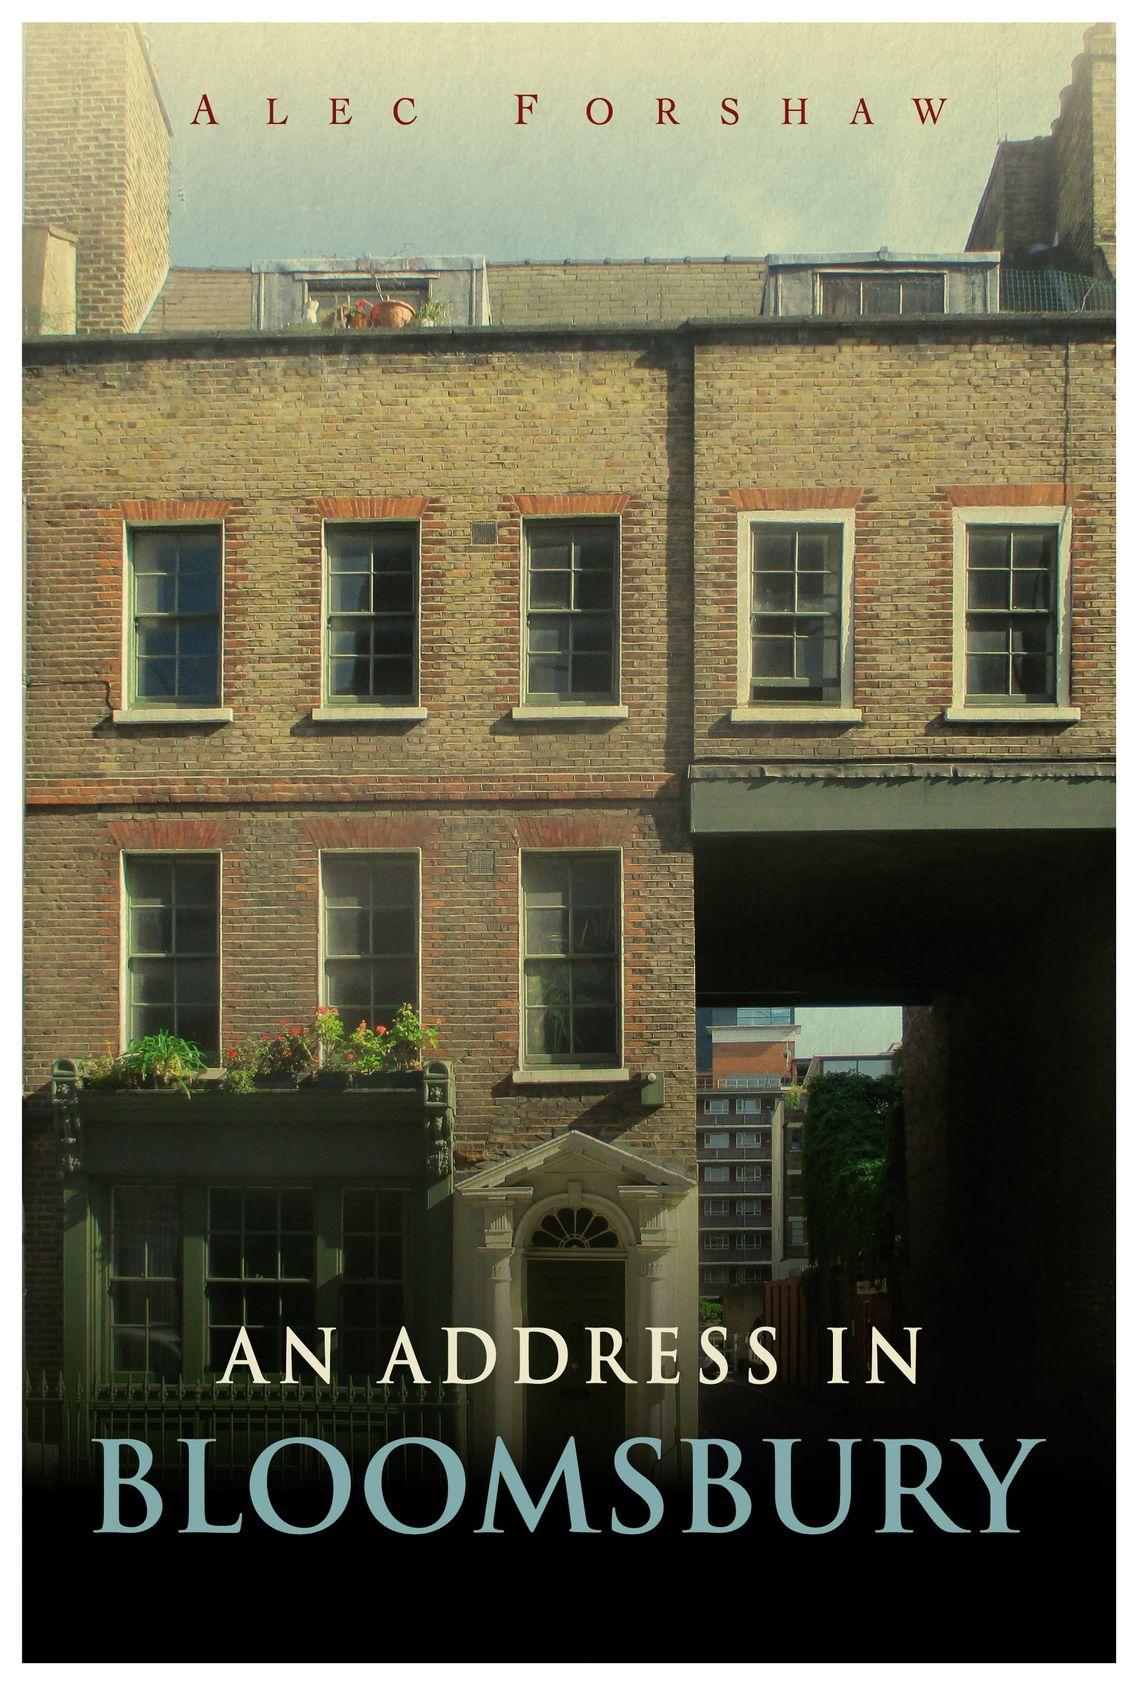 Alec Forshaw's Self-Publishing Journey